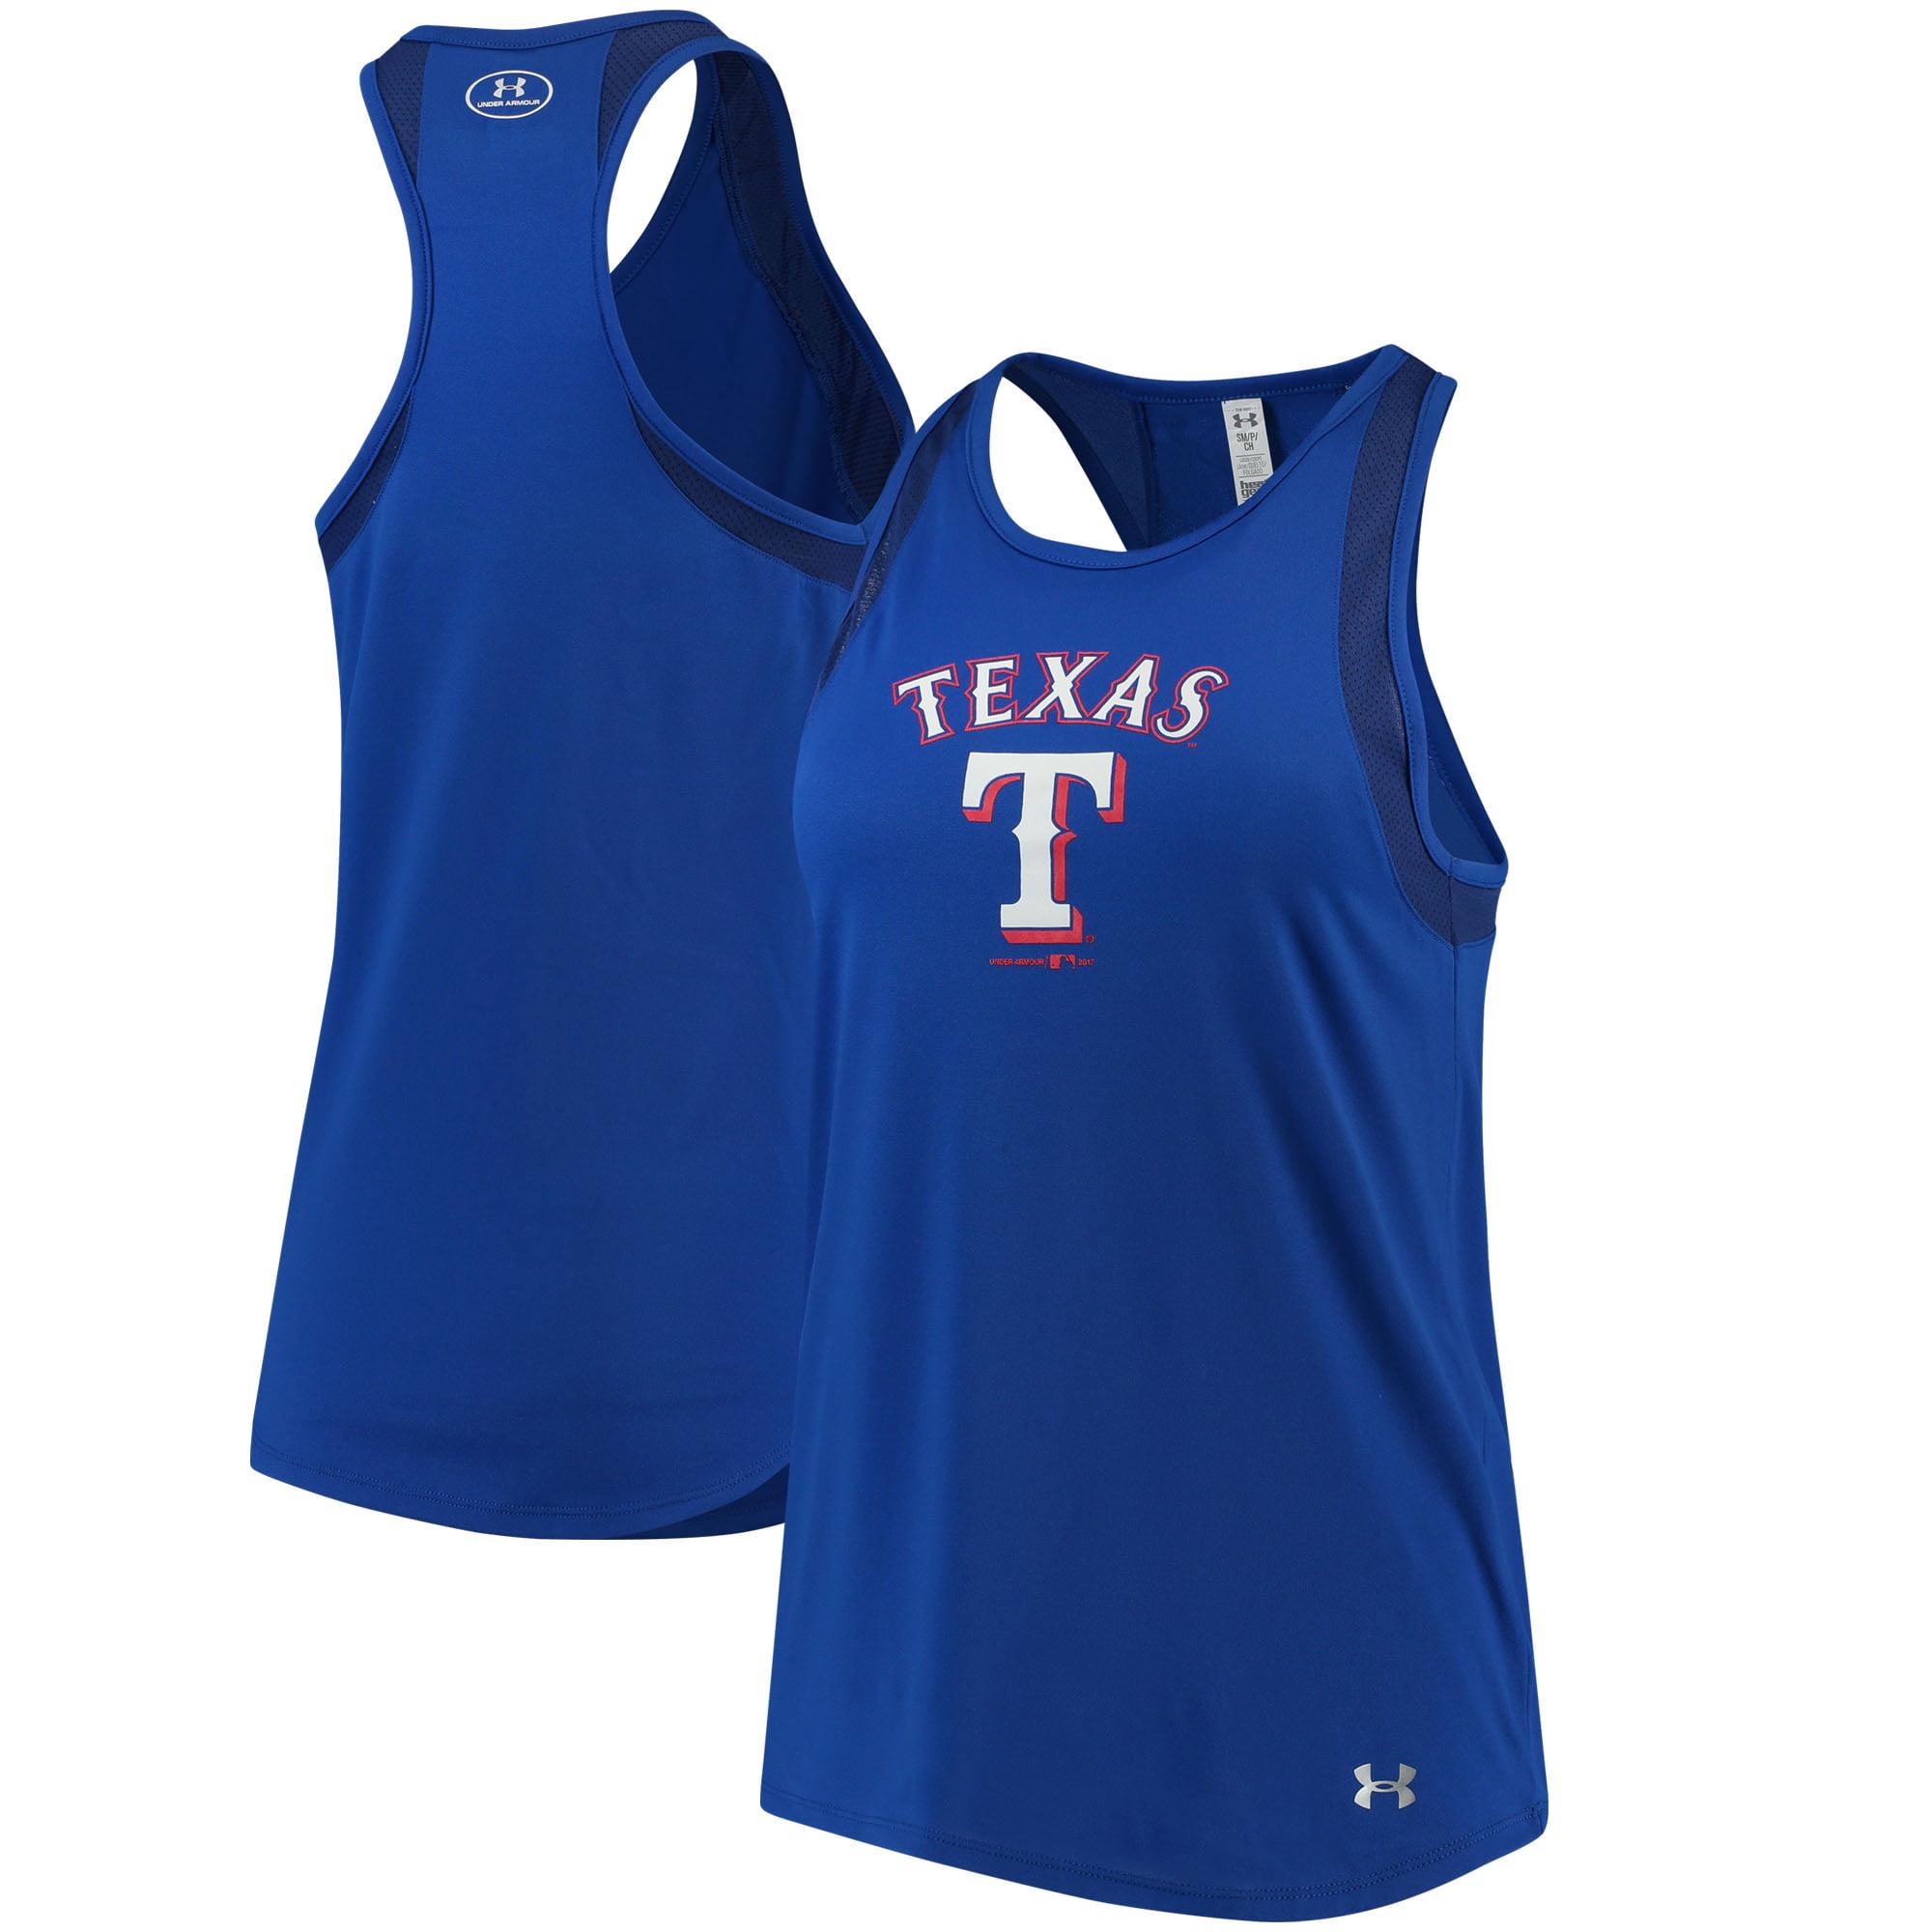 Texas Rangers Under Armour Women's Pointelle Mesh Performance Tank Top - Royal